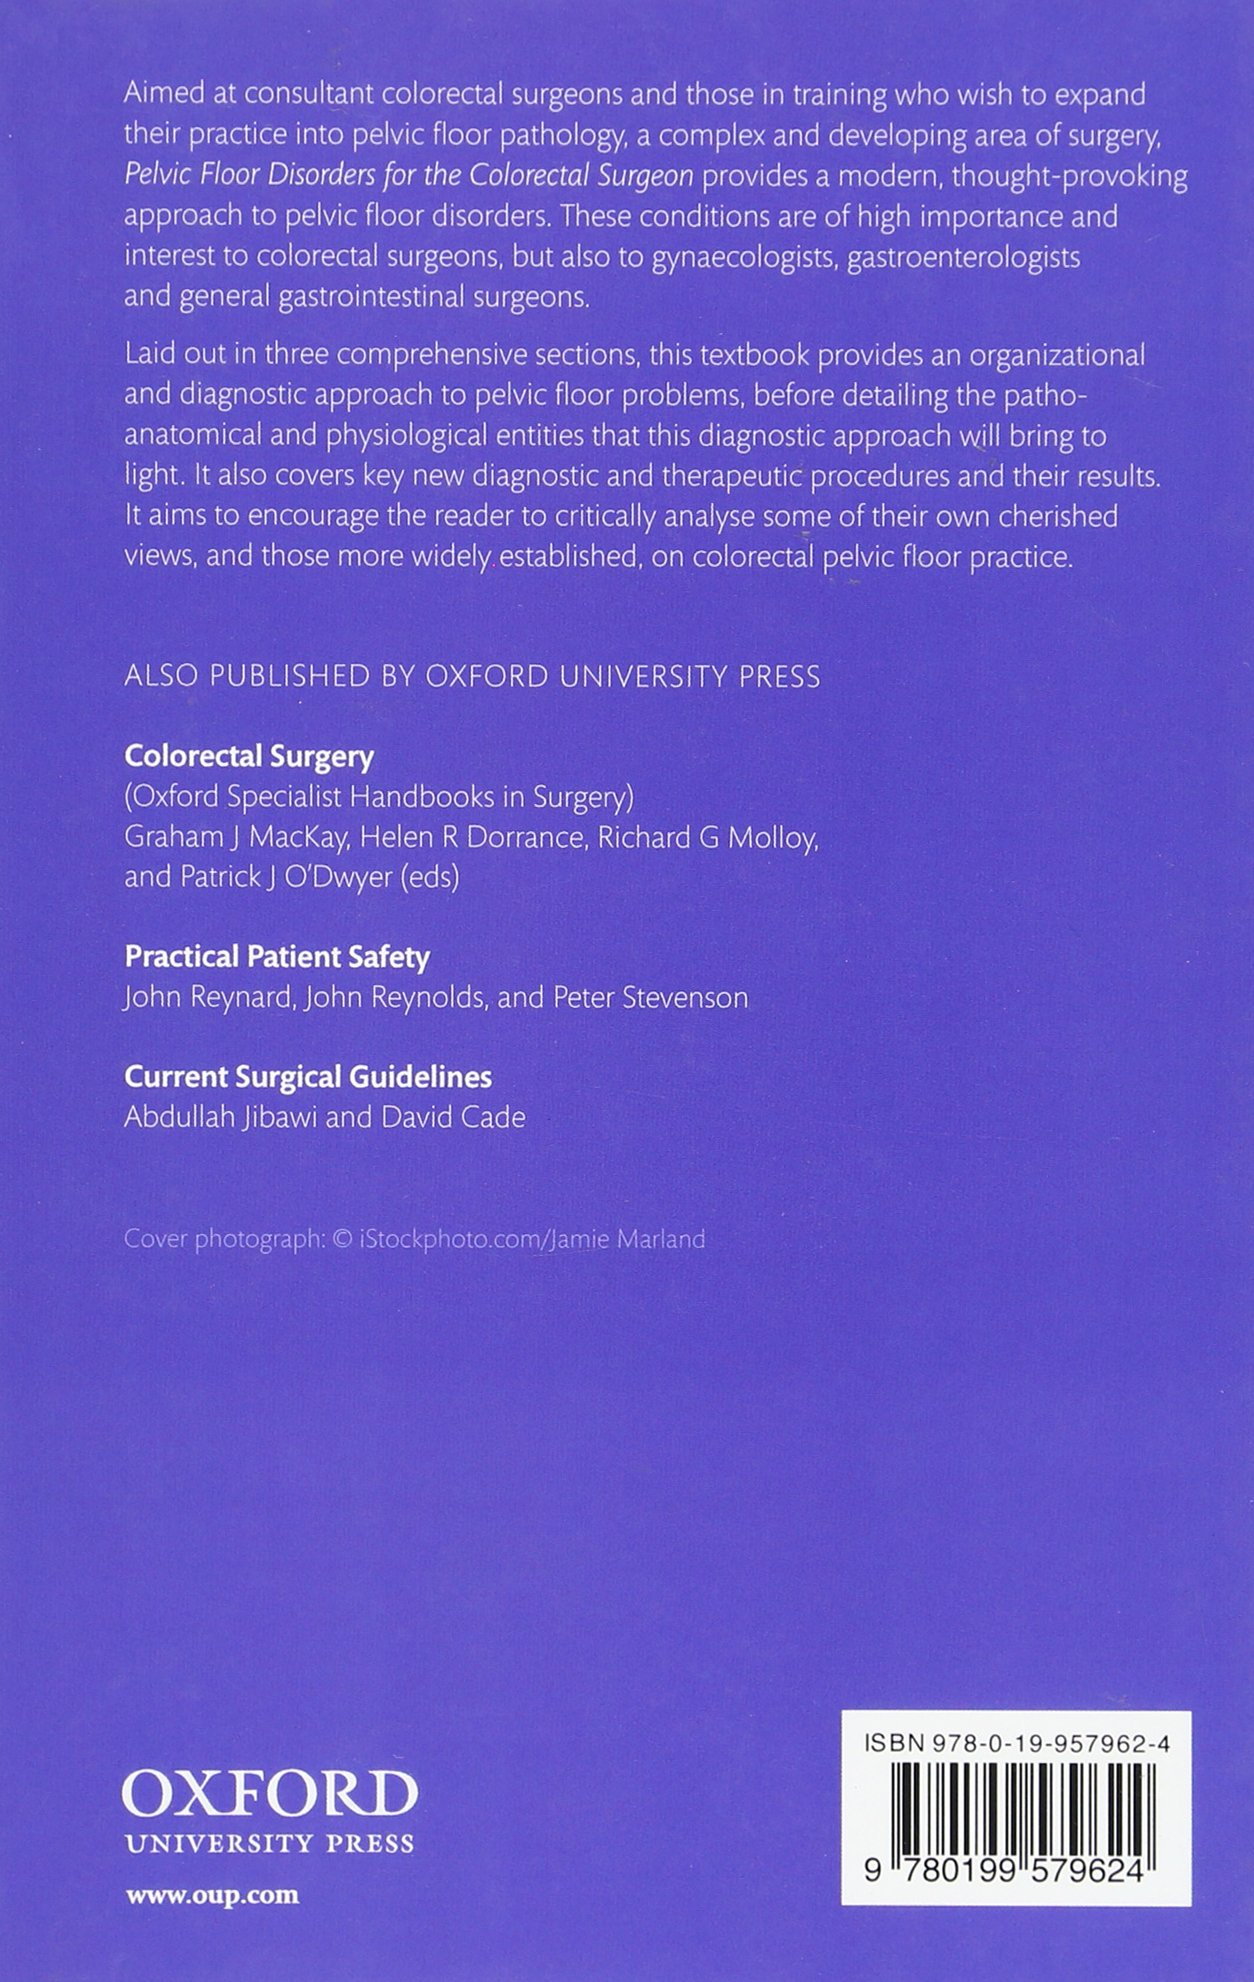 Pelvic Floor Disorders For The Colorectal Surgeon: Amazon.co.uk: Ian  Lindsey, Karen Nugent, Tony Dixon: 9780199579624: Books